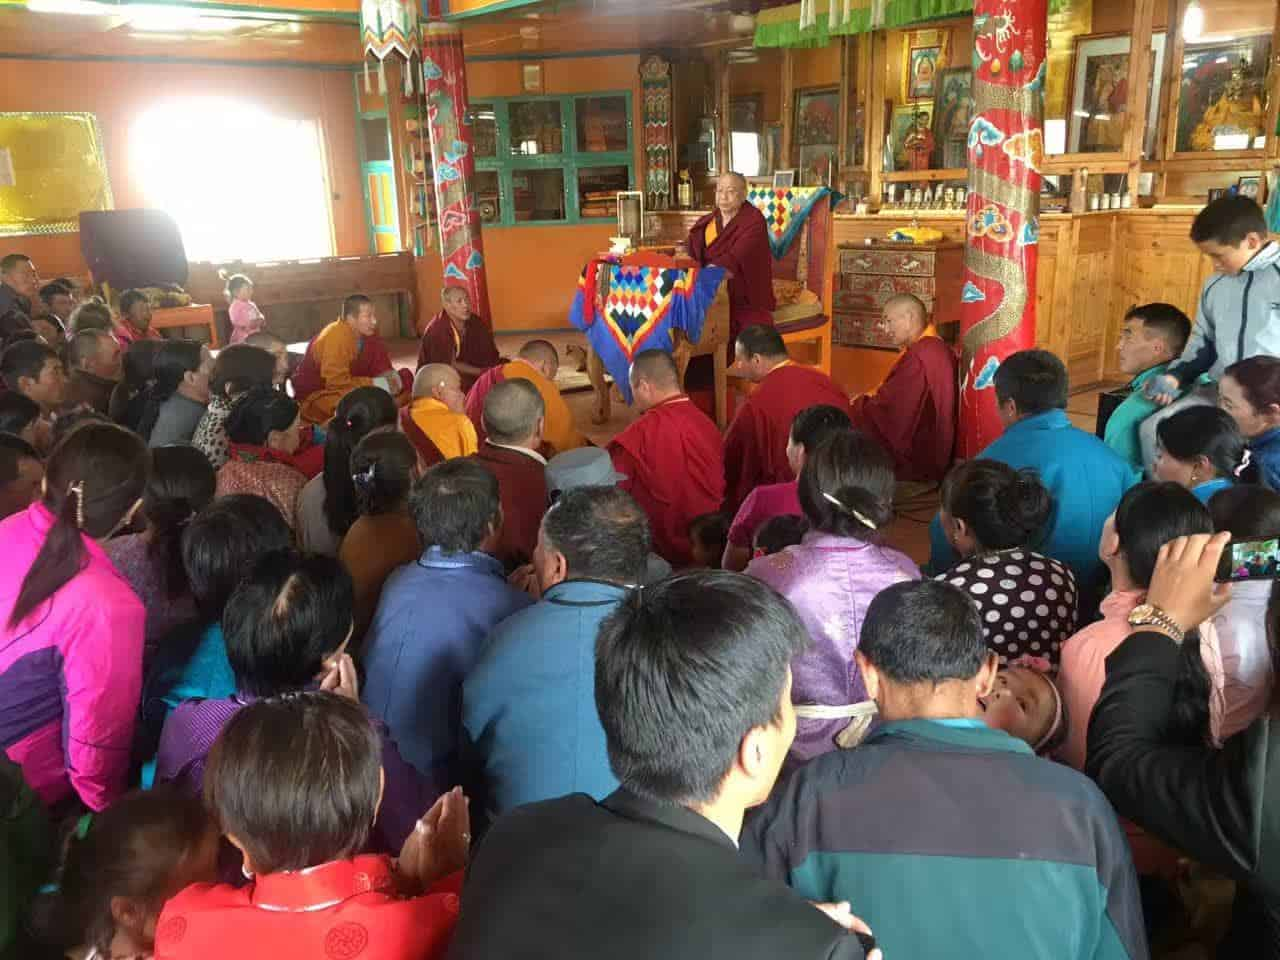 gosok-rinpoche-mongolia-2016-bff9bee31ba739bcf791ef6bd66bd2c